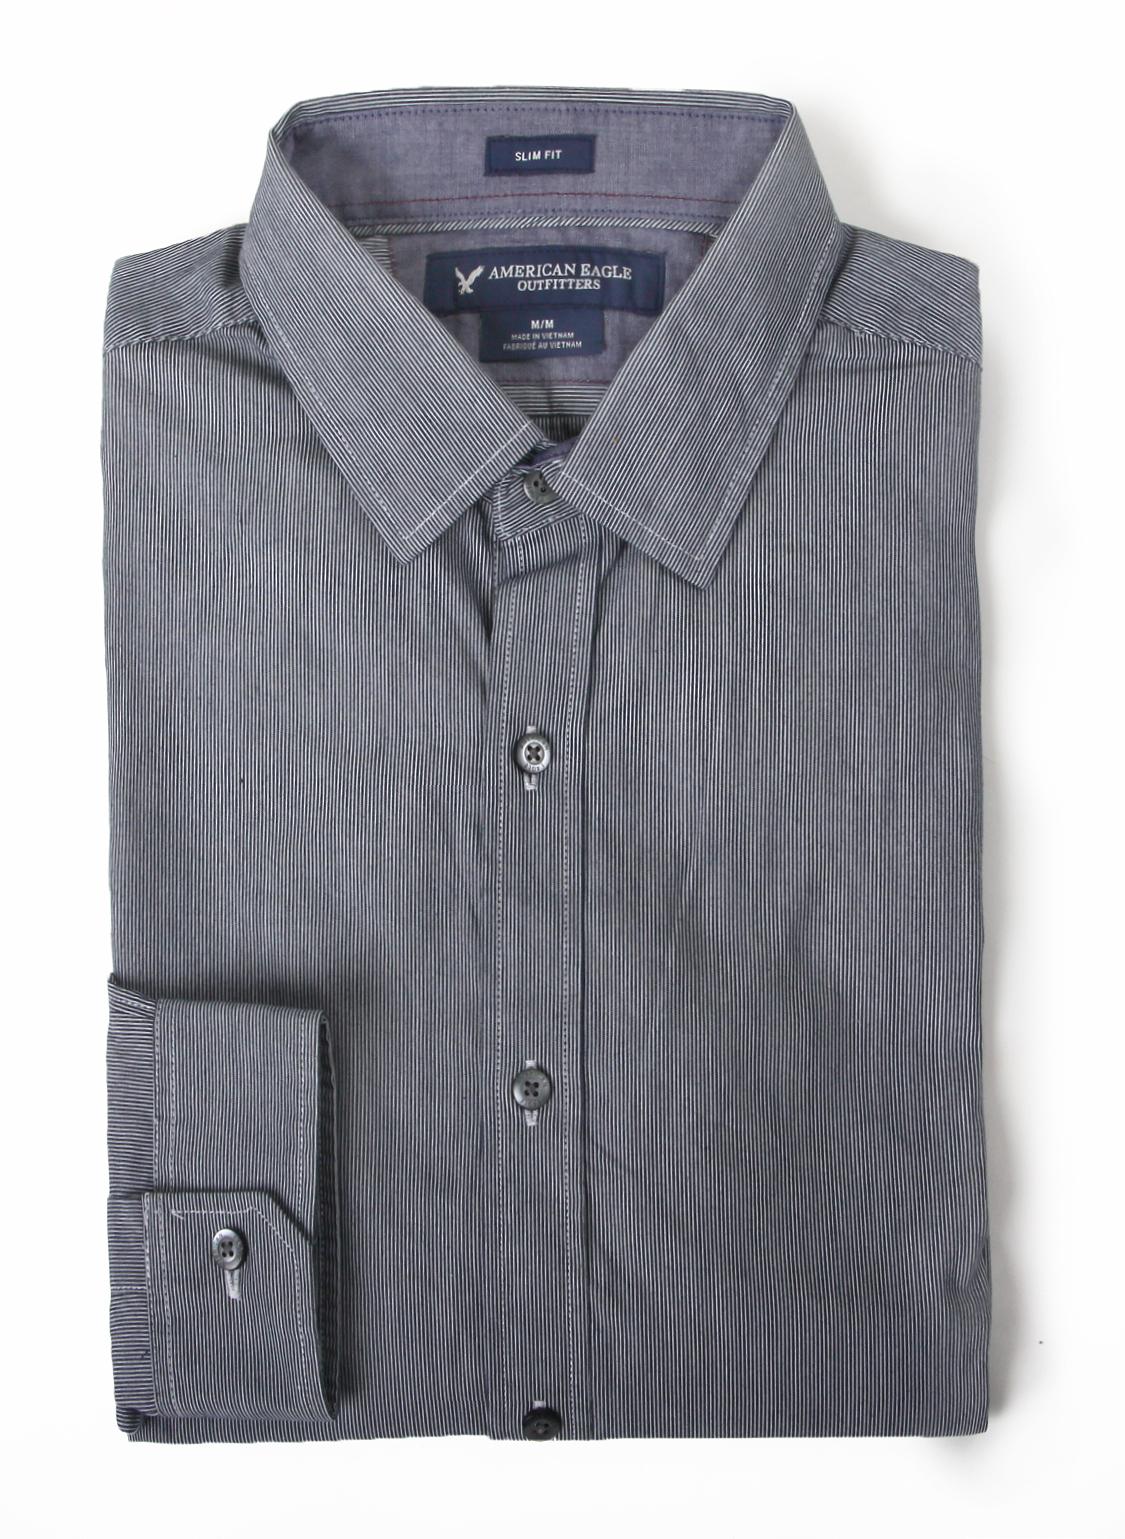 Shop Phan_3t Hàng VNXK origianal !!Zara,celio,nautica,raul lauren...Giá tốt nhất!! - 27